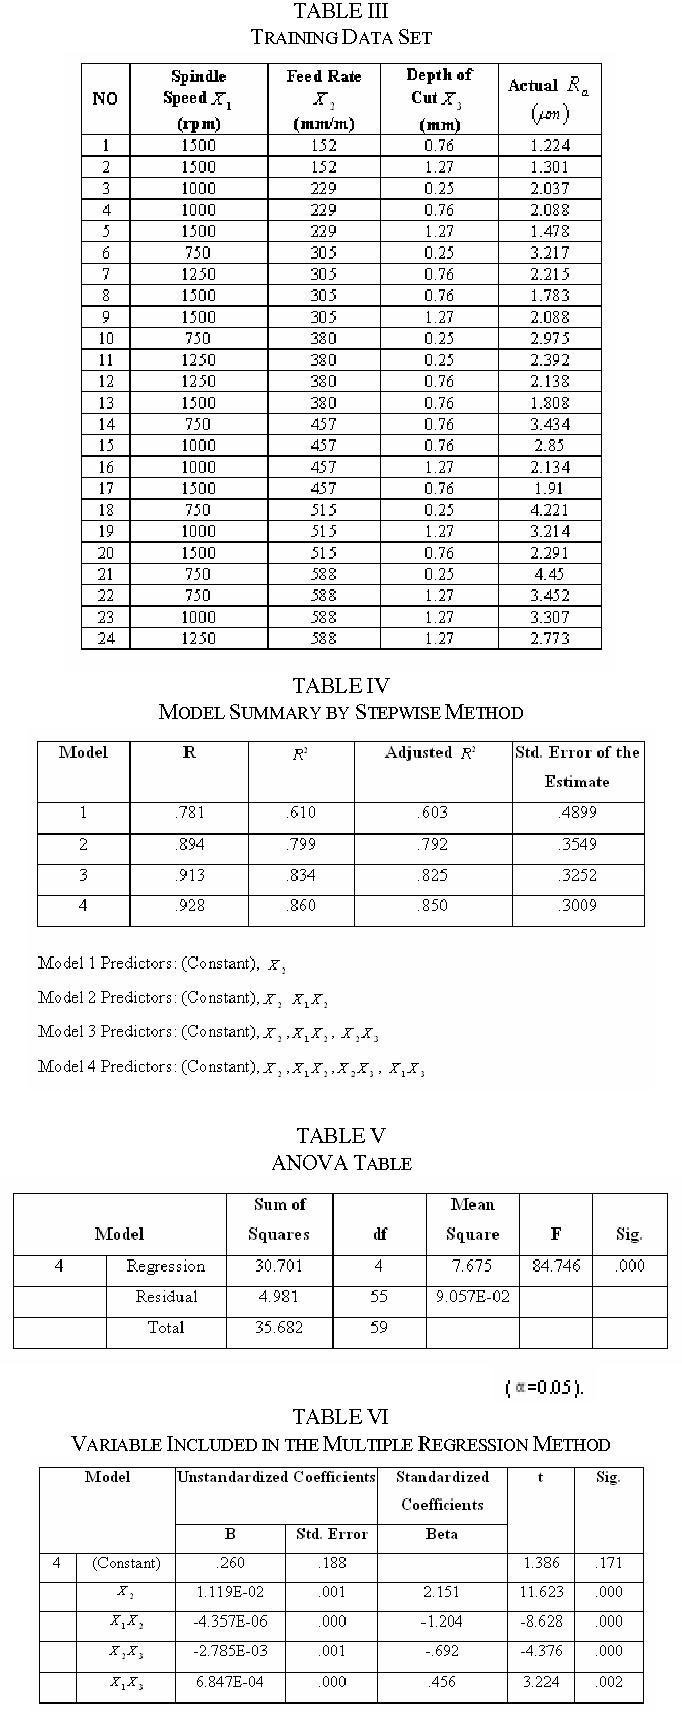 TABLE V ANOVA TABLE